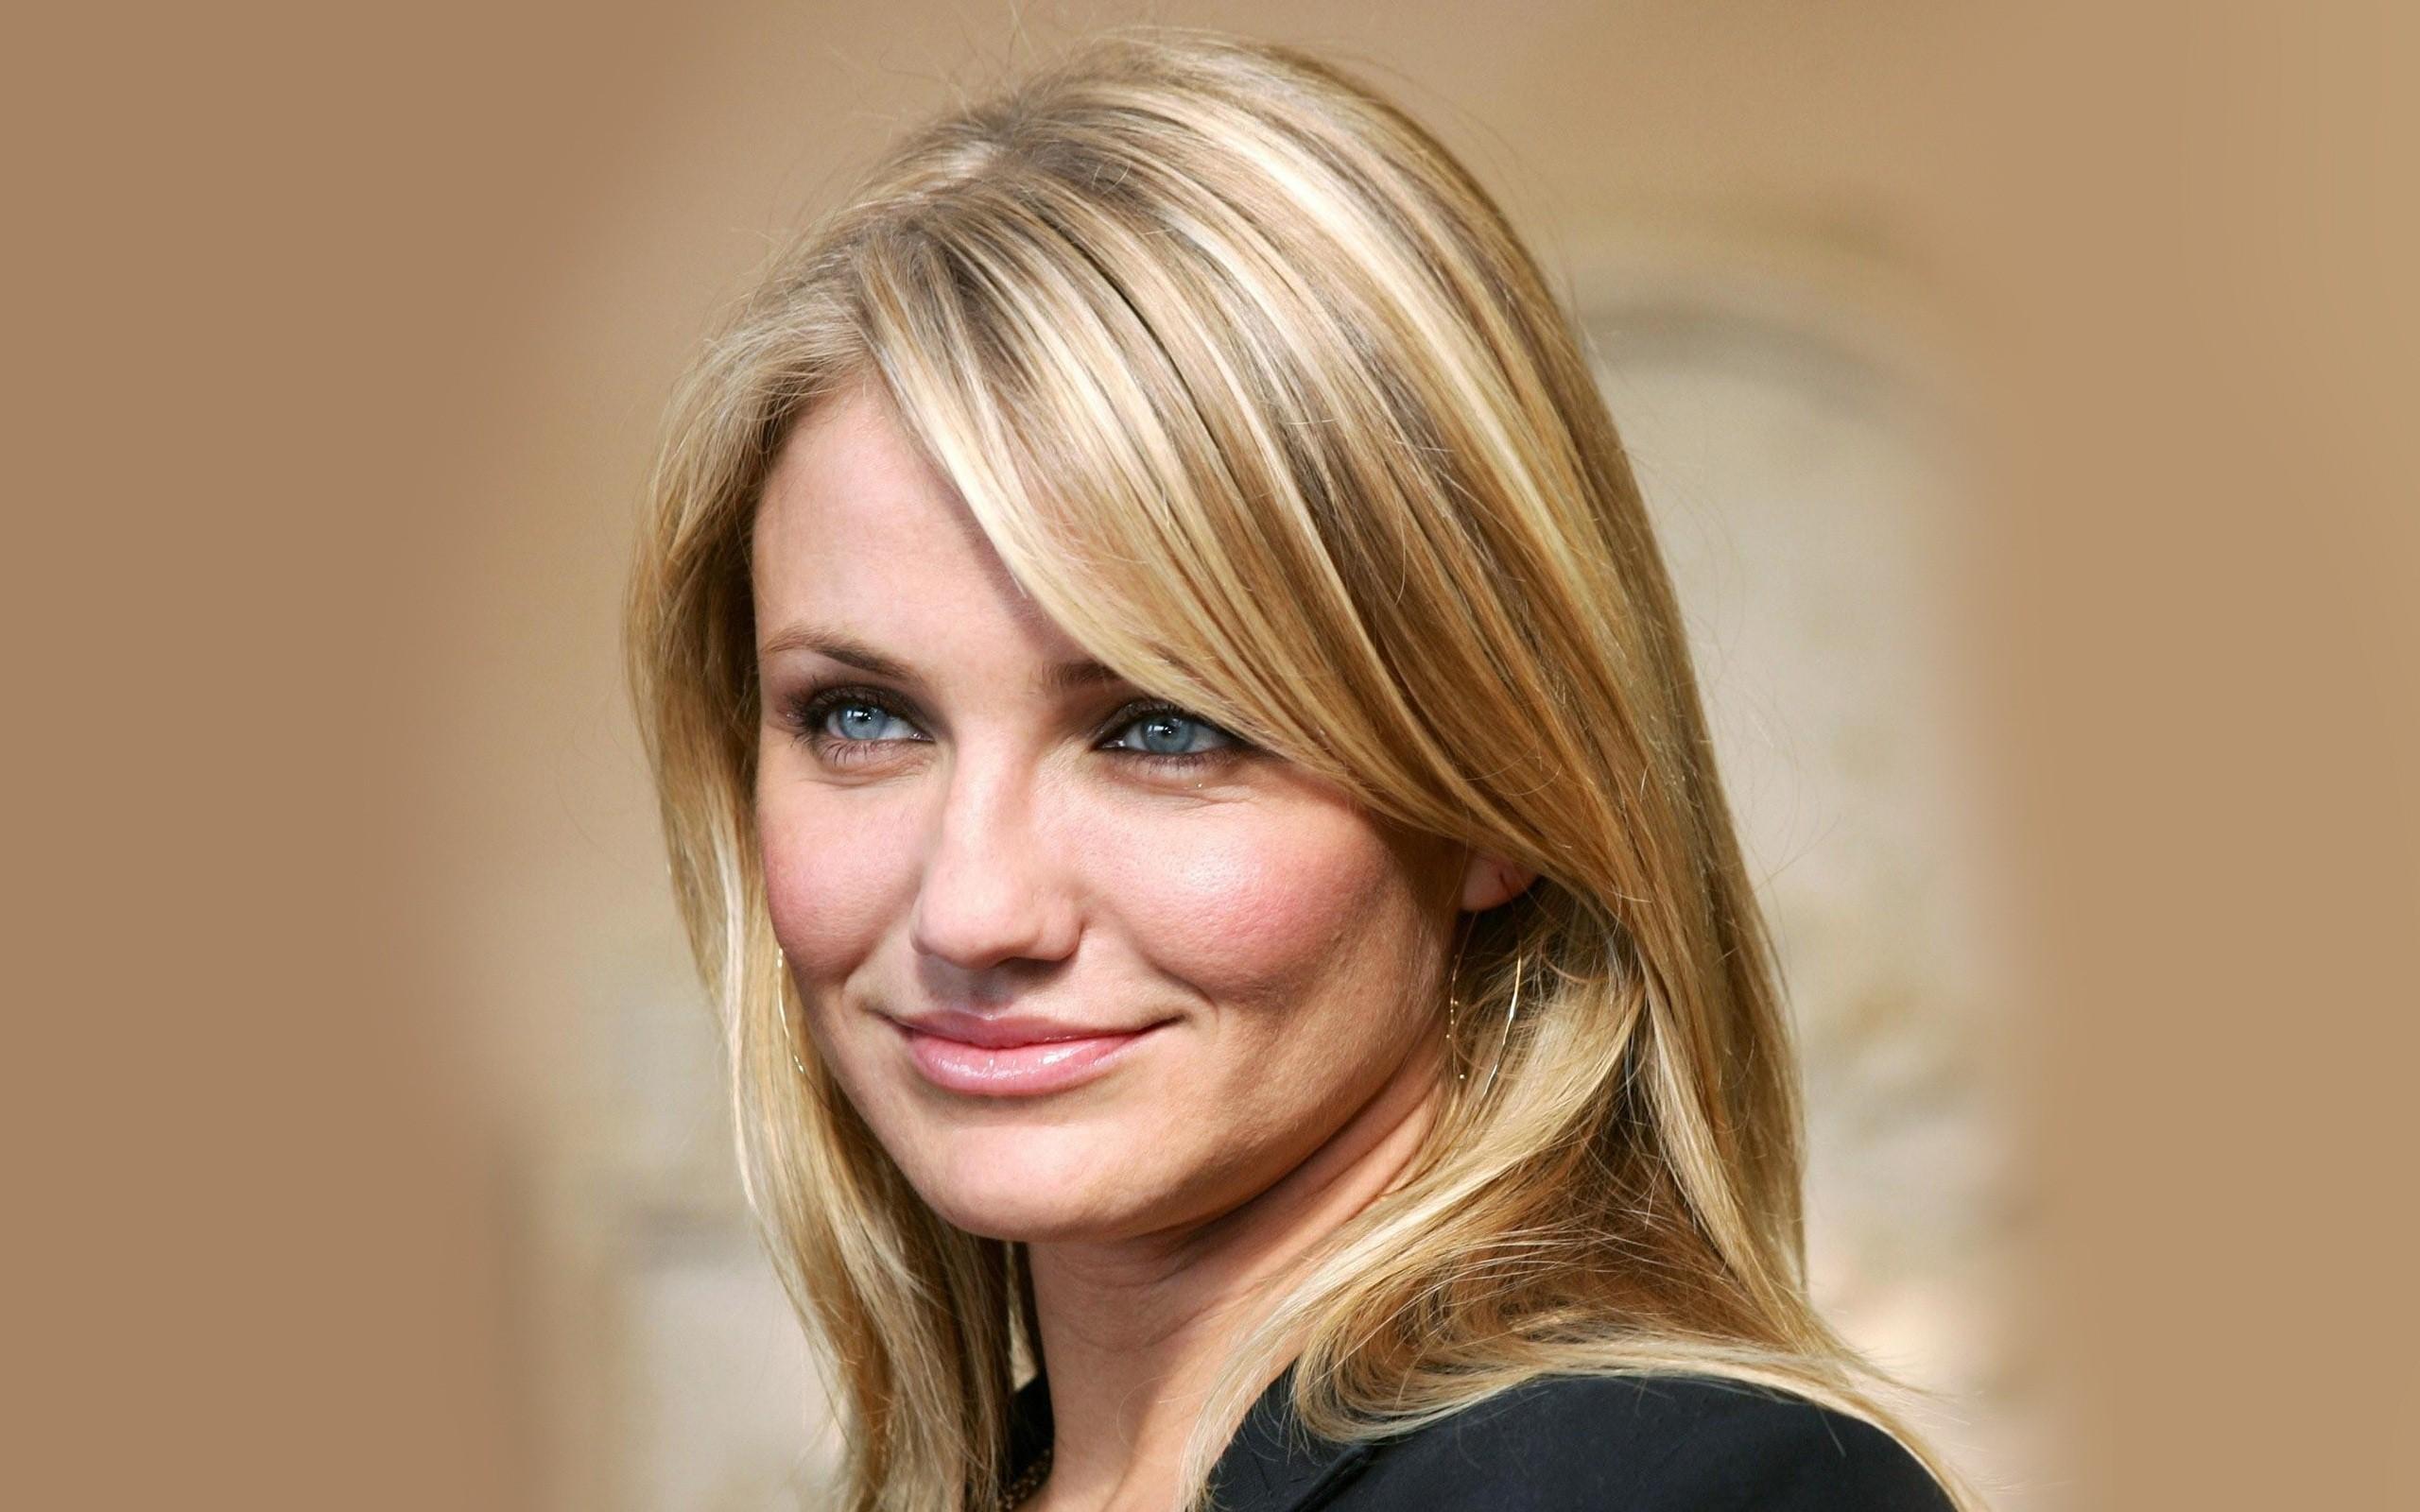 Cameron diaz wallpapers wallpapertag - Hollywood desktop wallpapers actresses ...